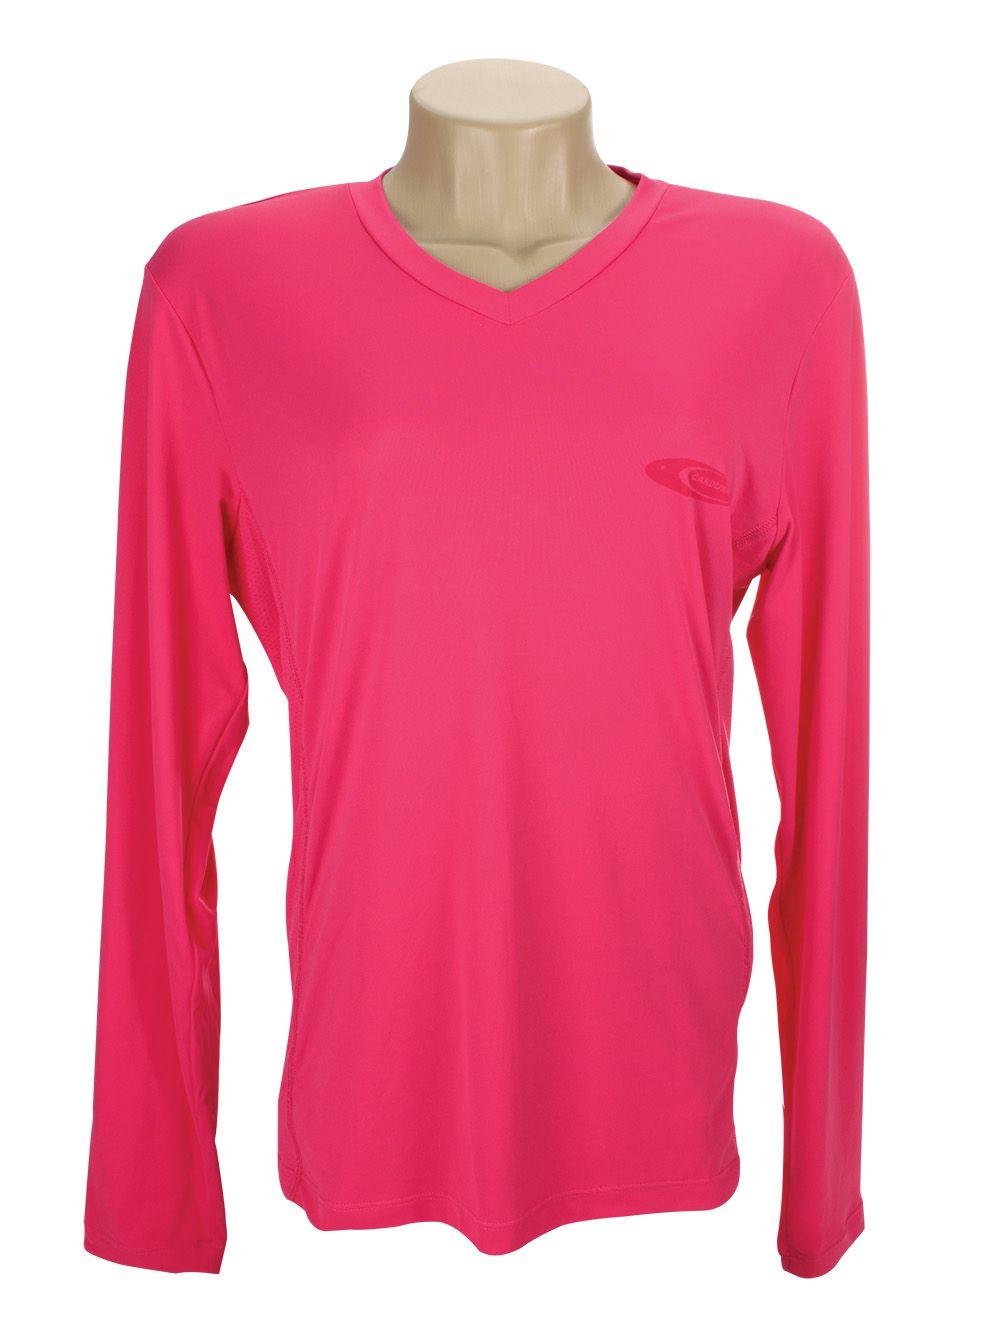 Camiseta Térmica ML feminina